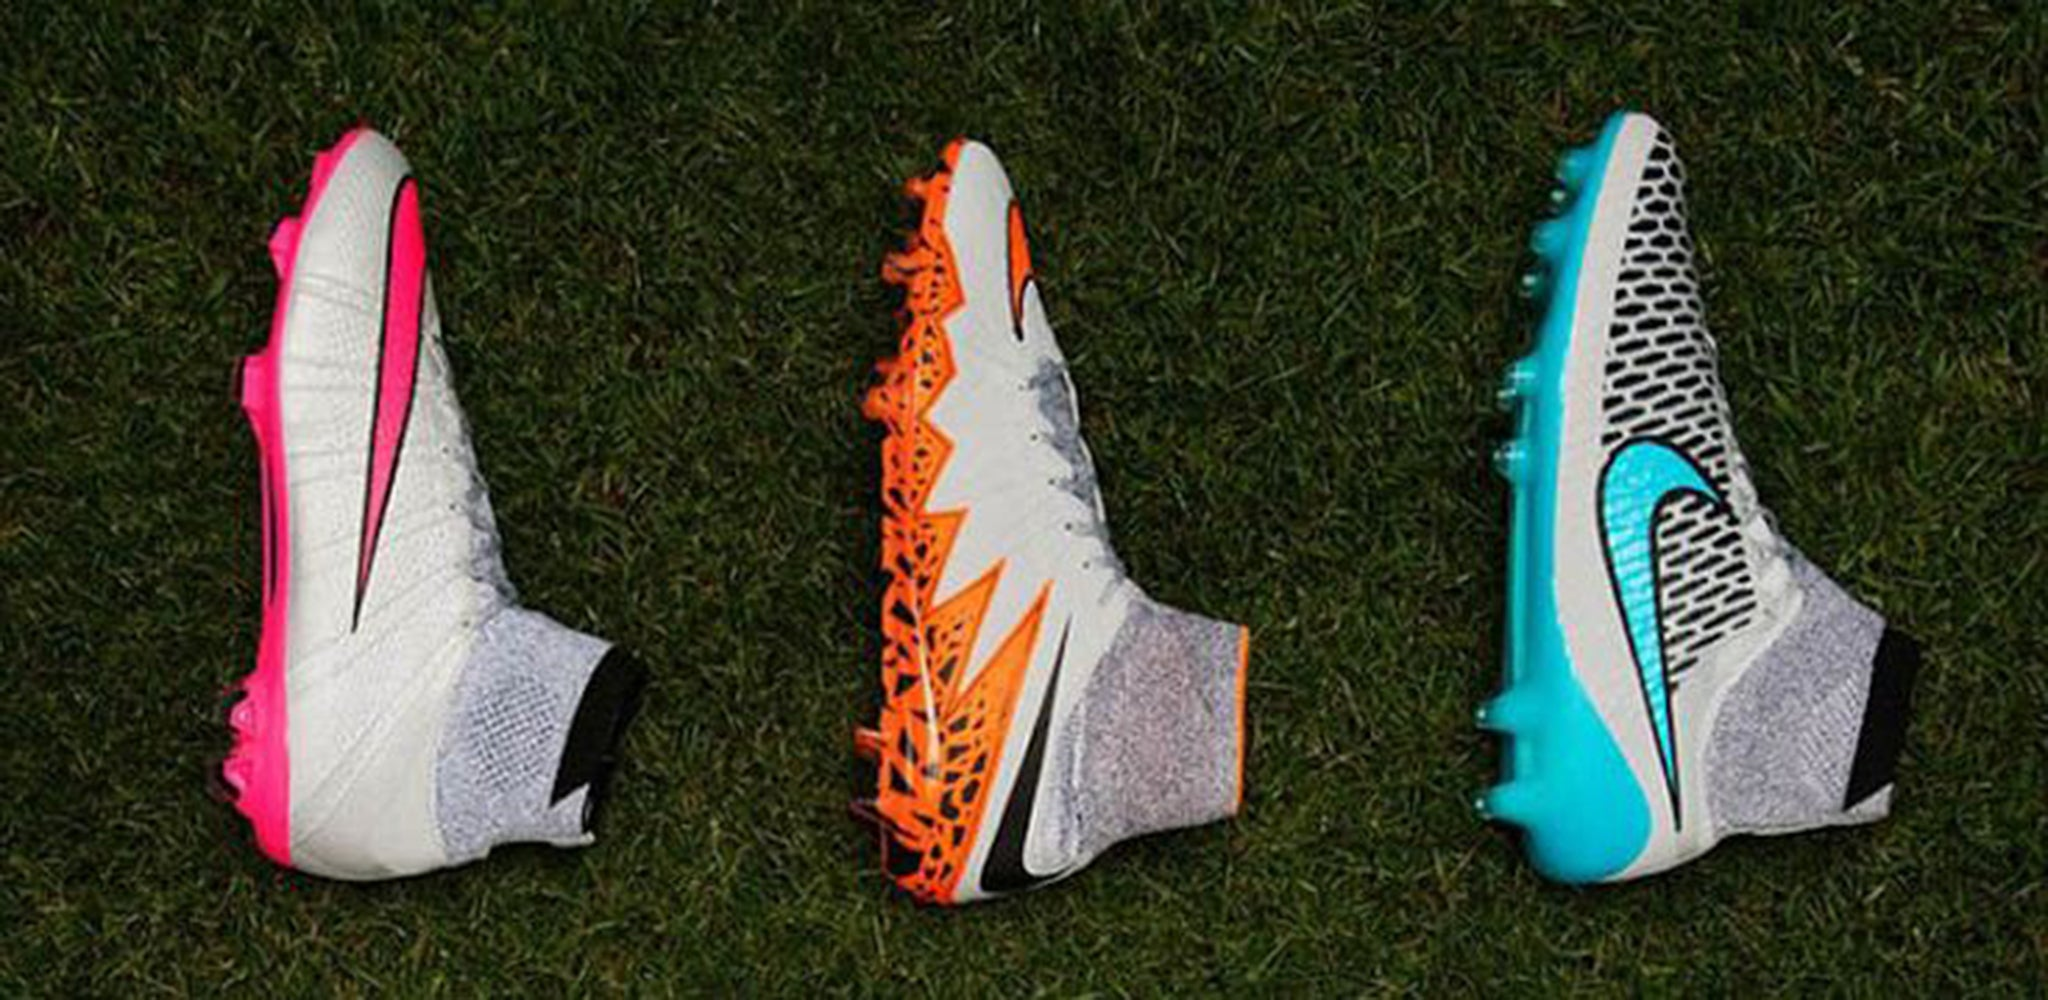 439f1329c49a Football boots 2015 16  Nike